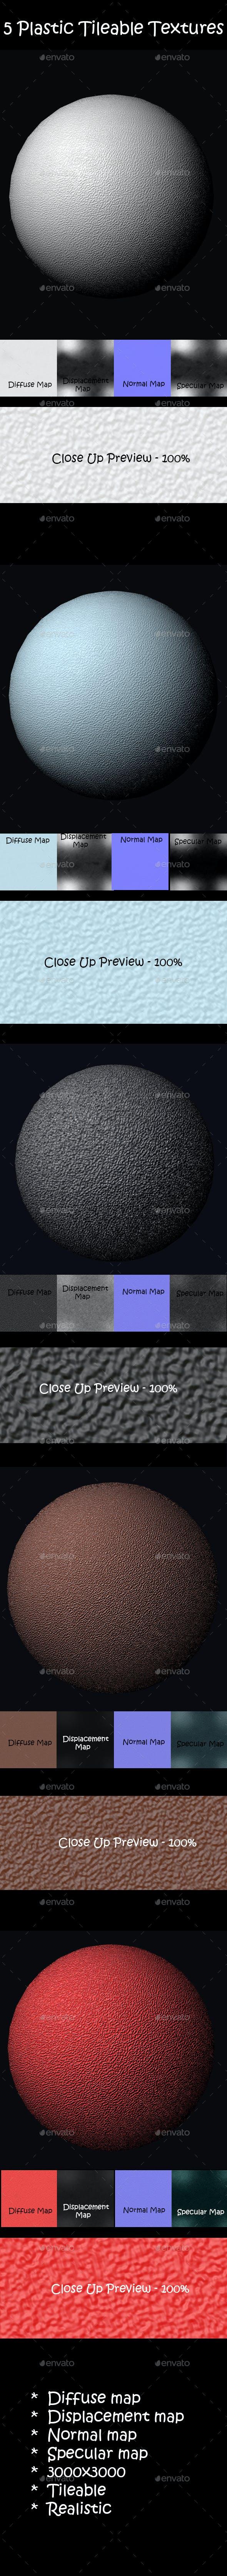 5 Realistic Plastic Tileable Textures - 3DOcean Item for Sale